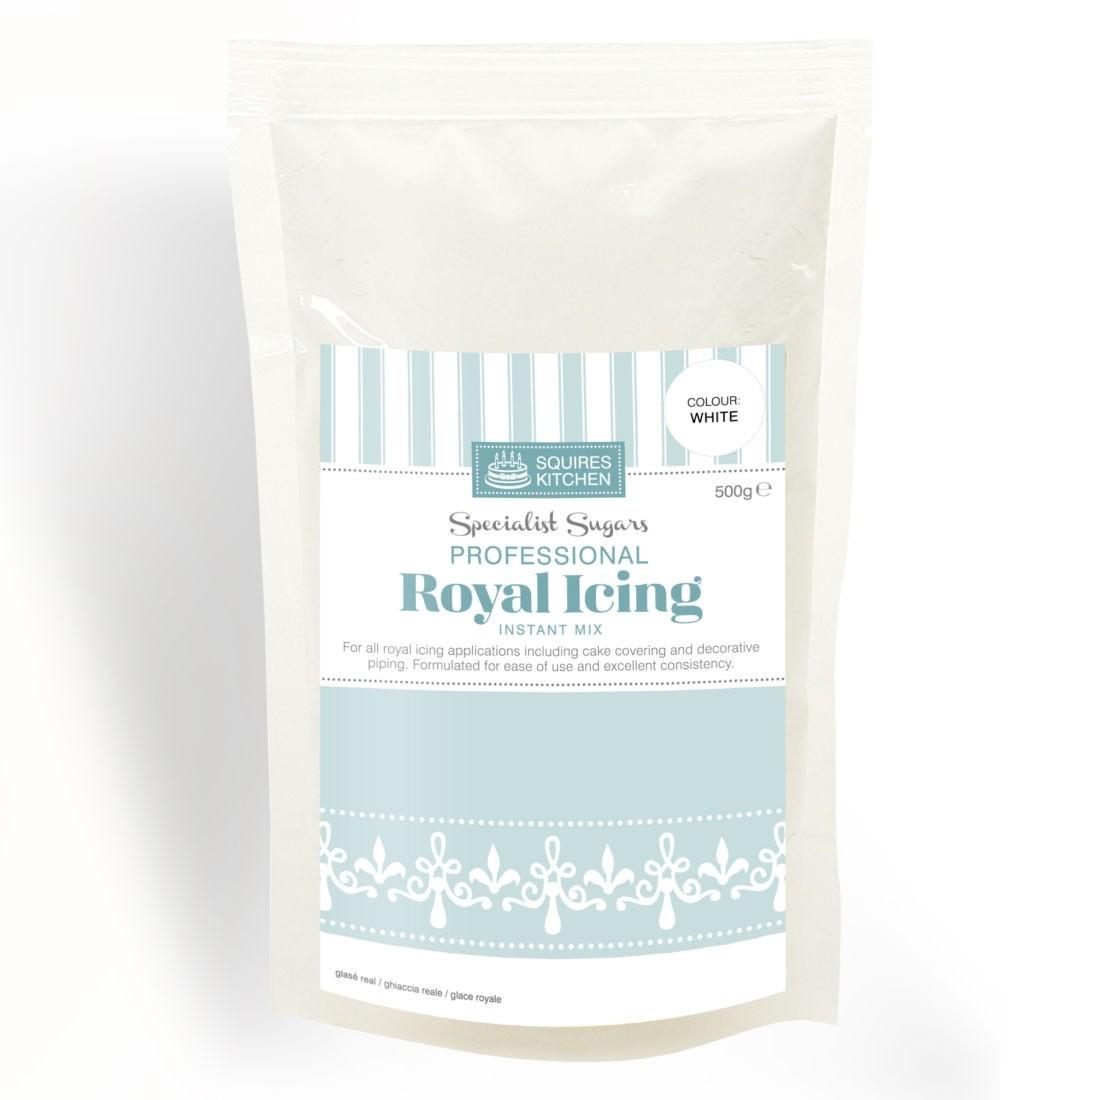 SK Professional Royal Icing Mix